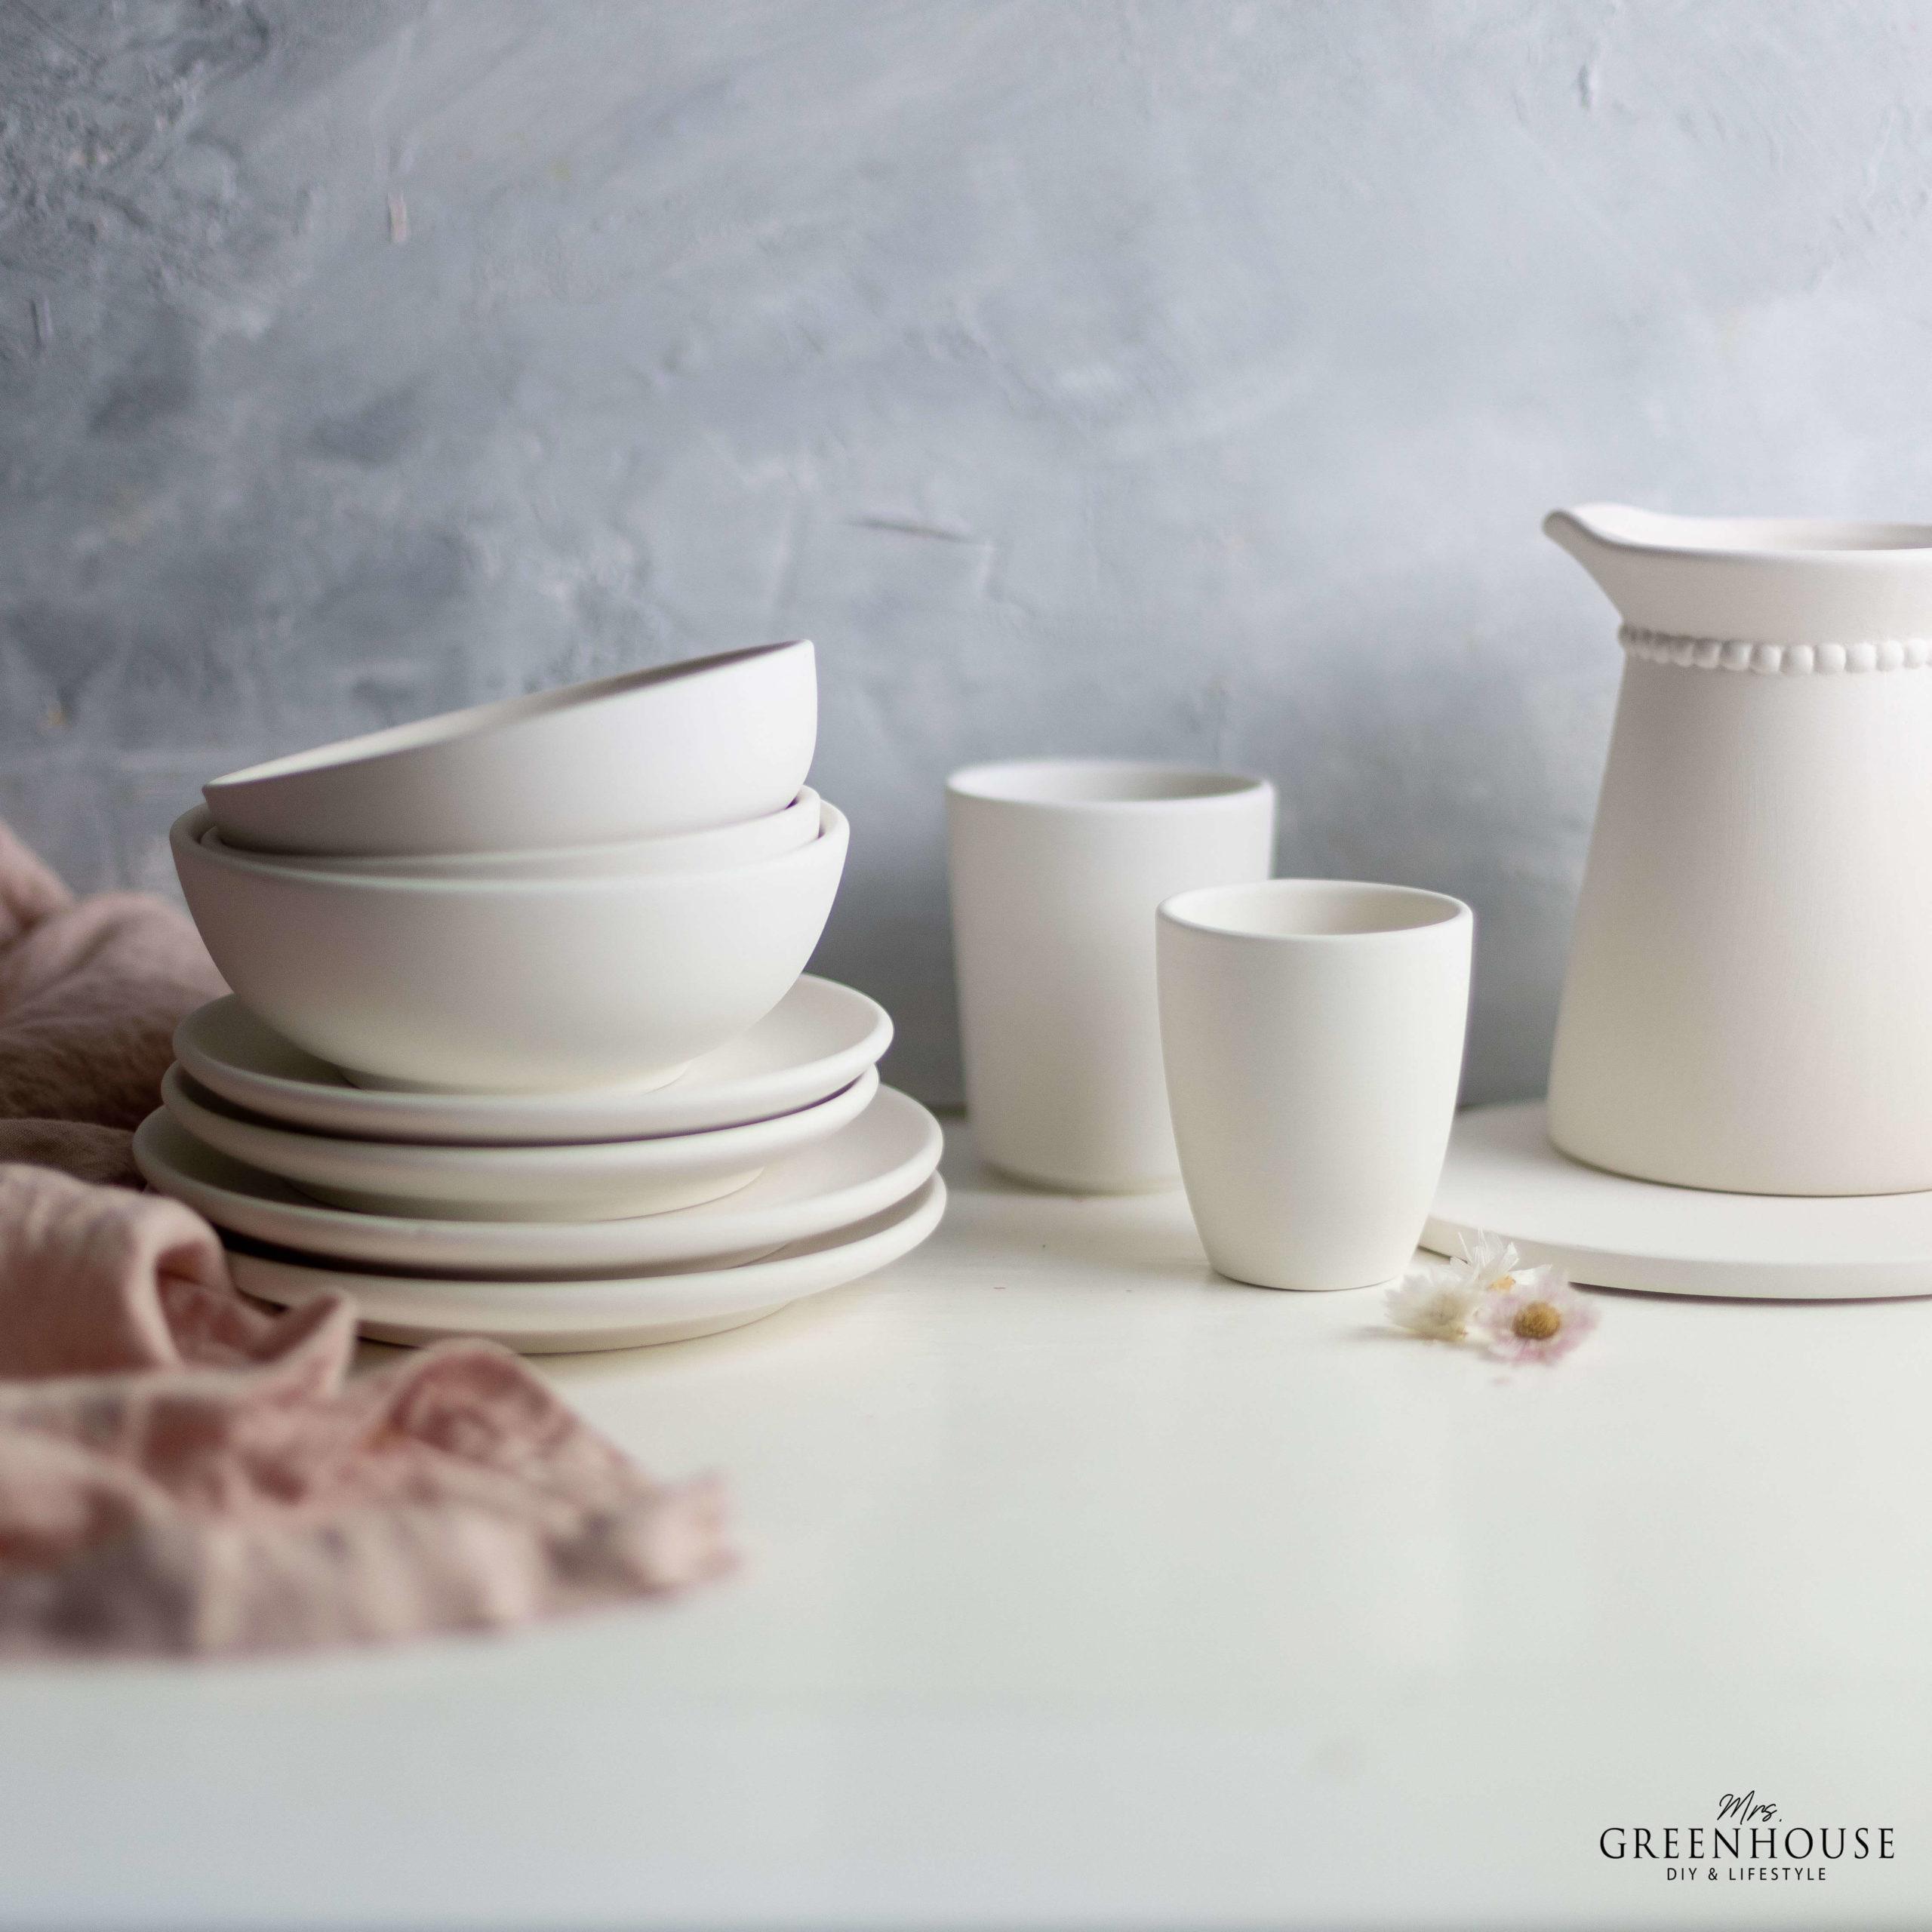 Keramik zuhause bemalen